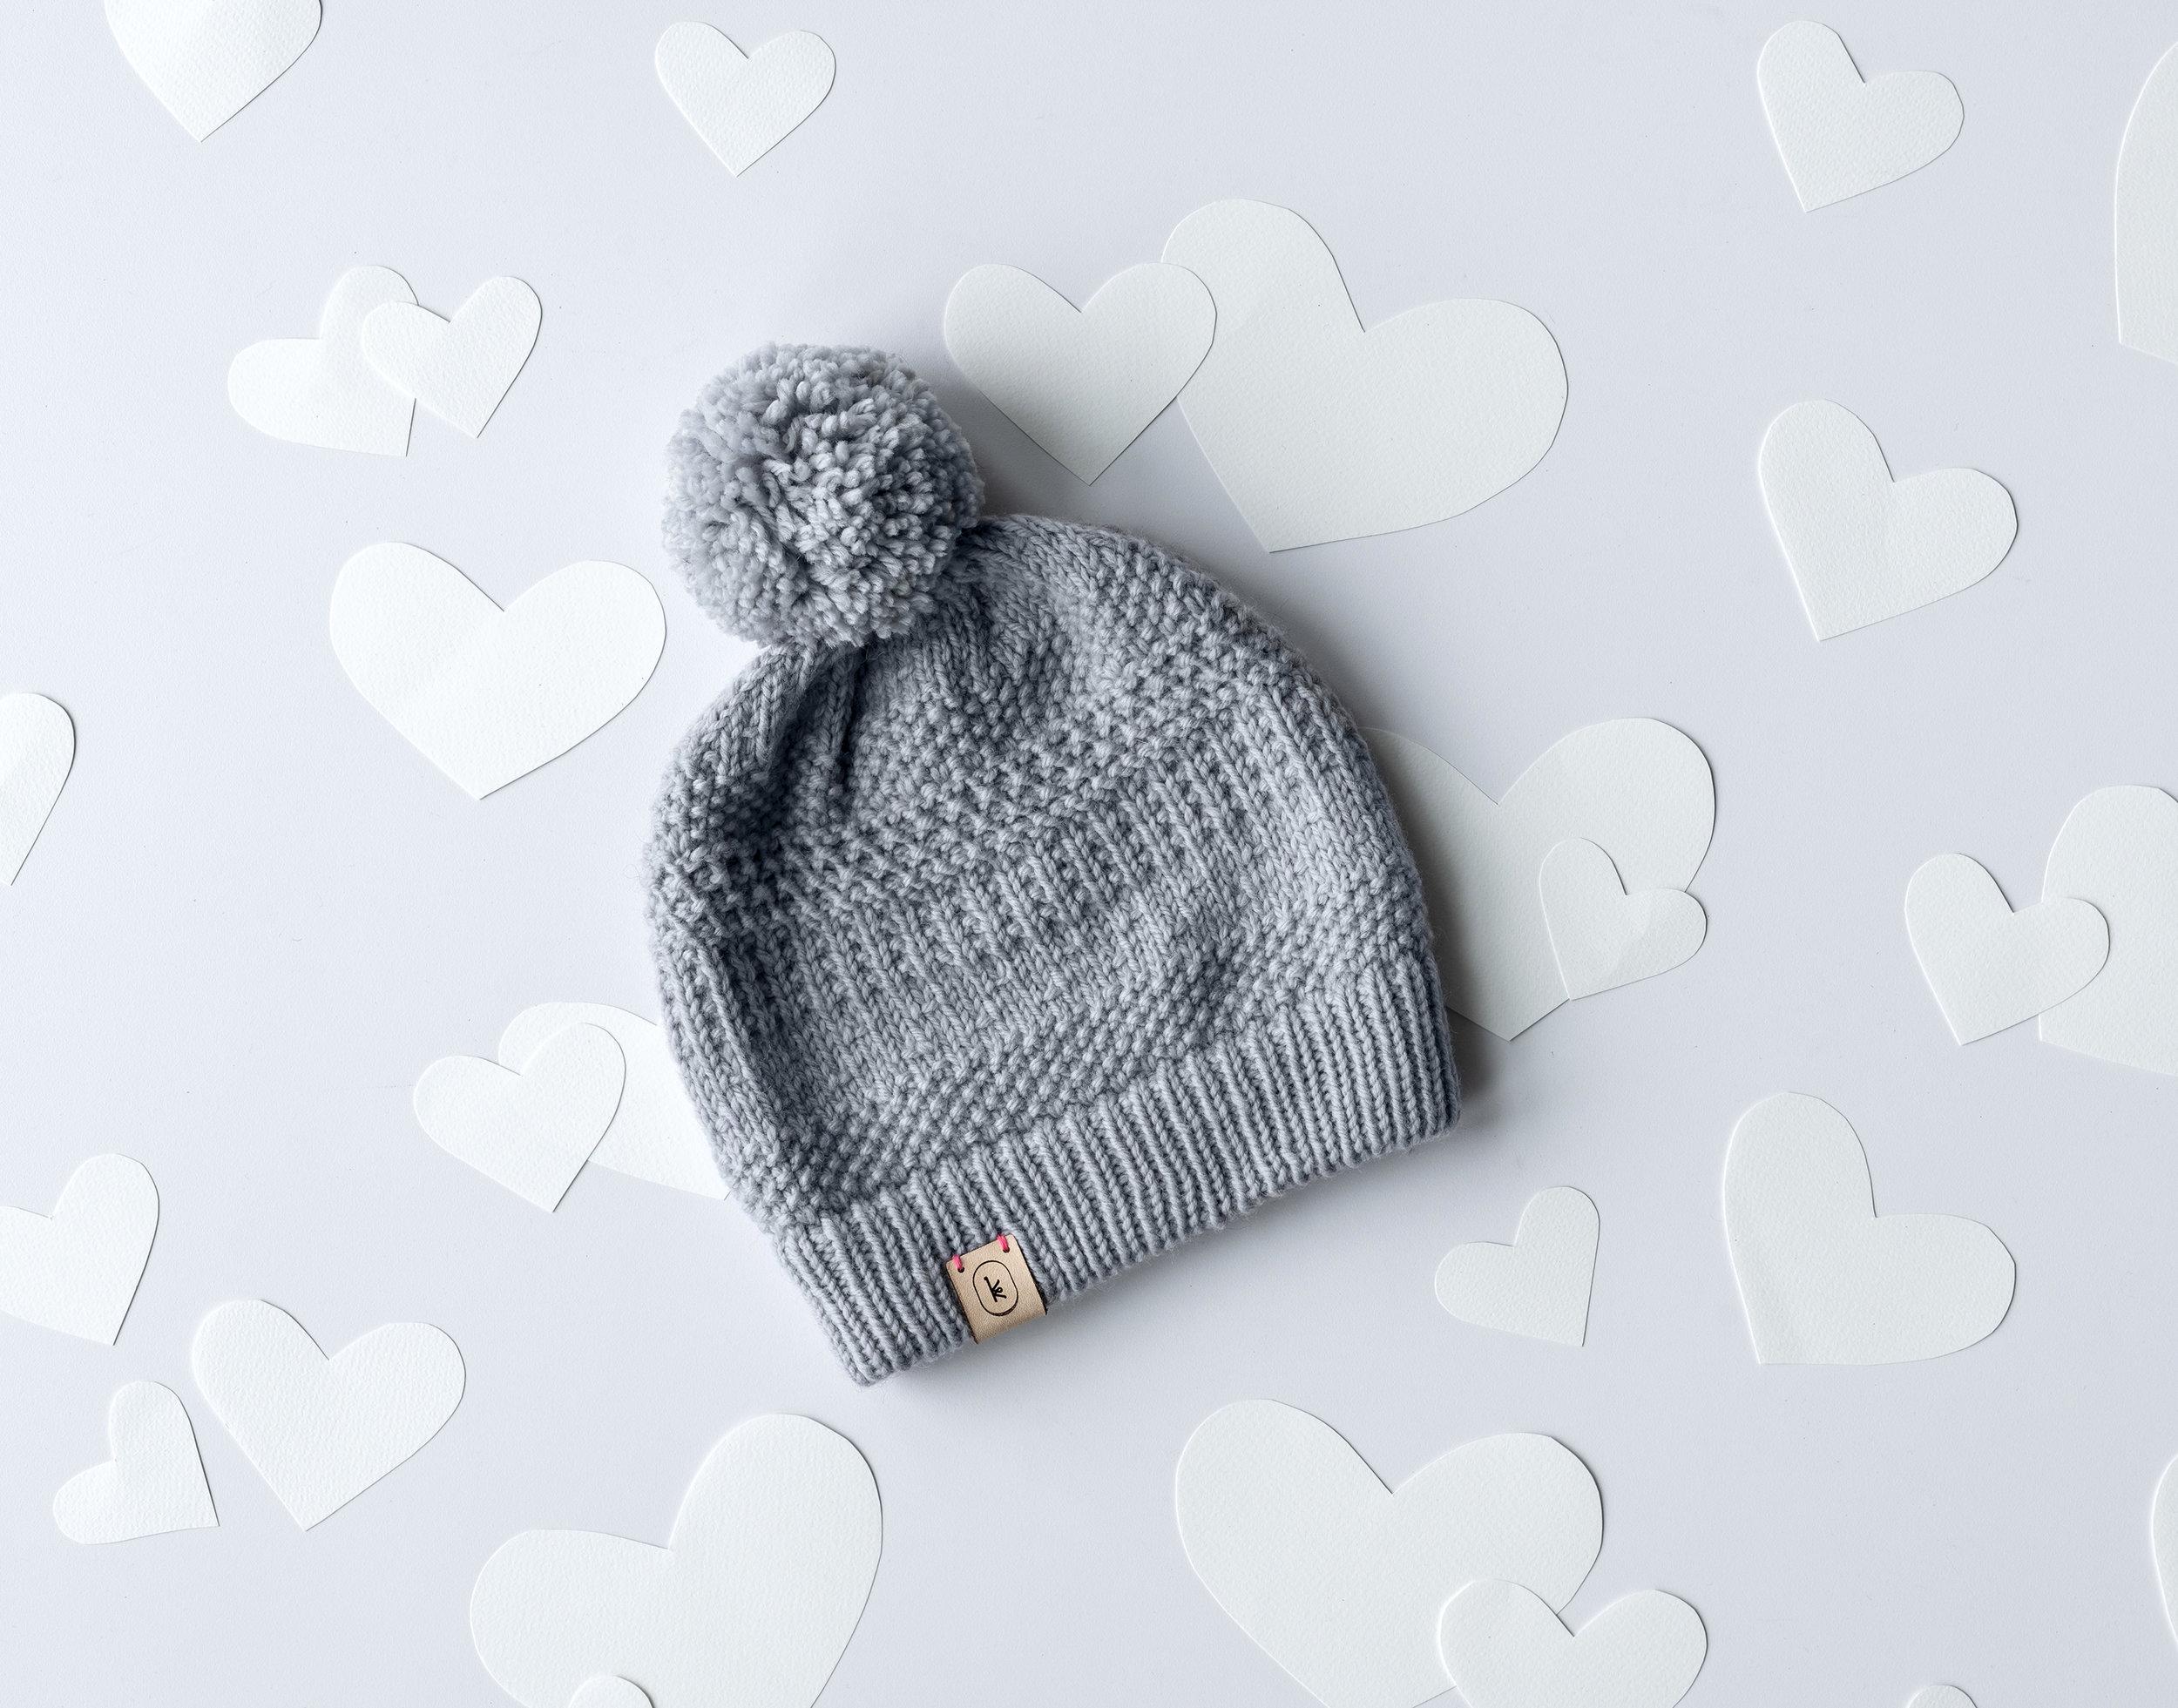 February Hat by Kate Gagnon Osborn